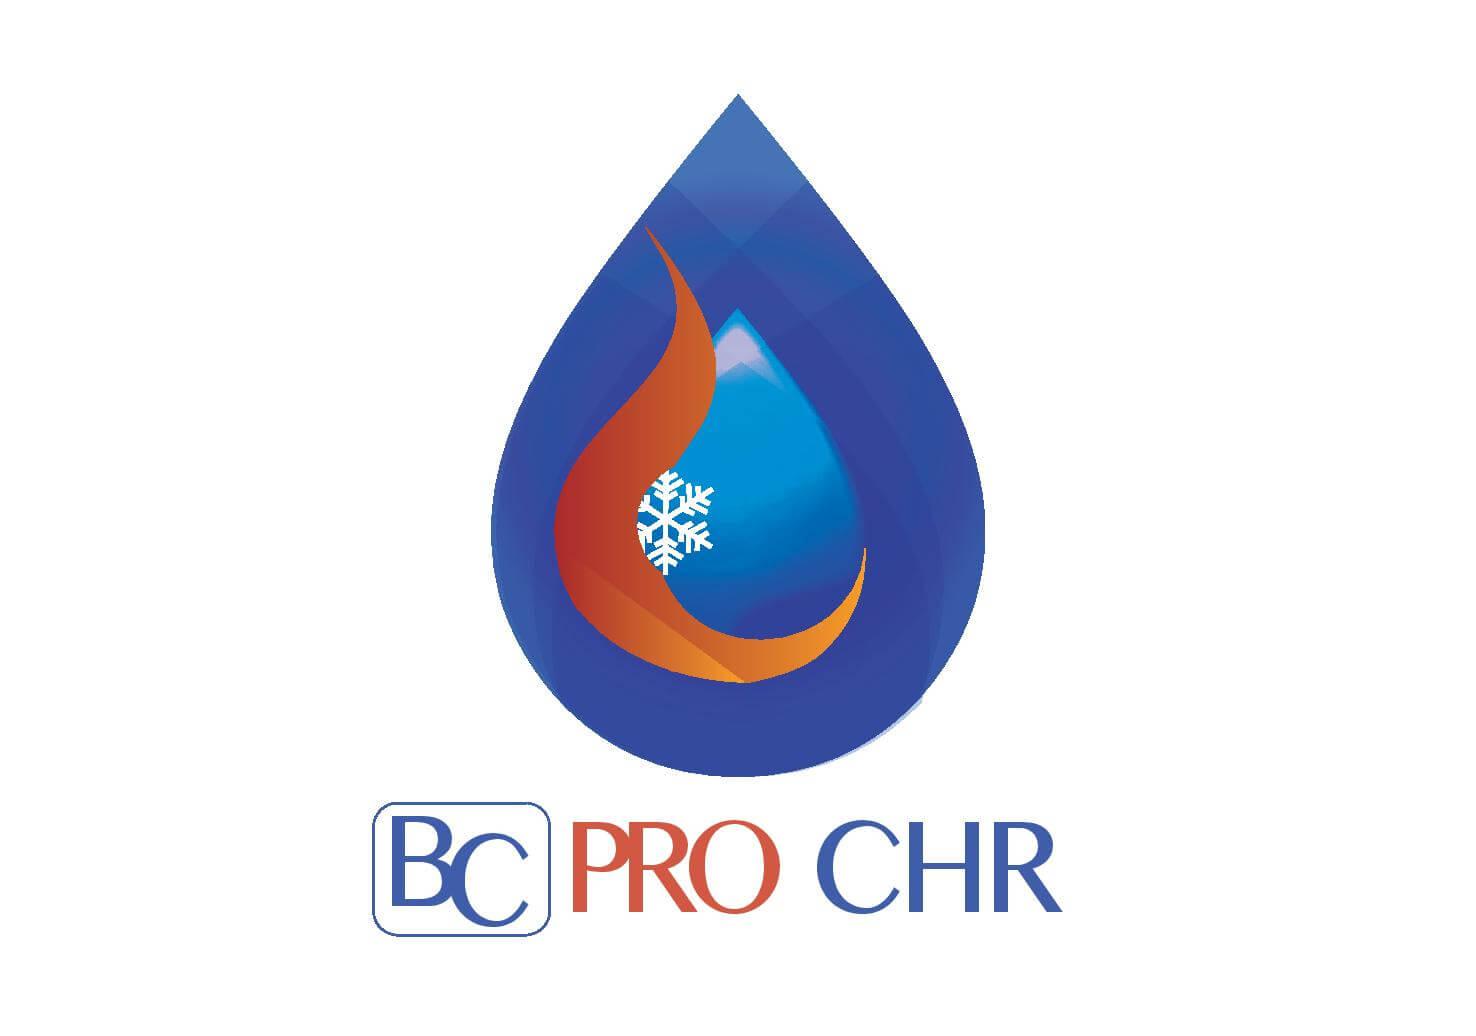 Contact BC PRO CHR